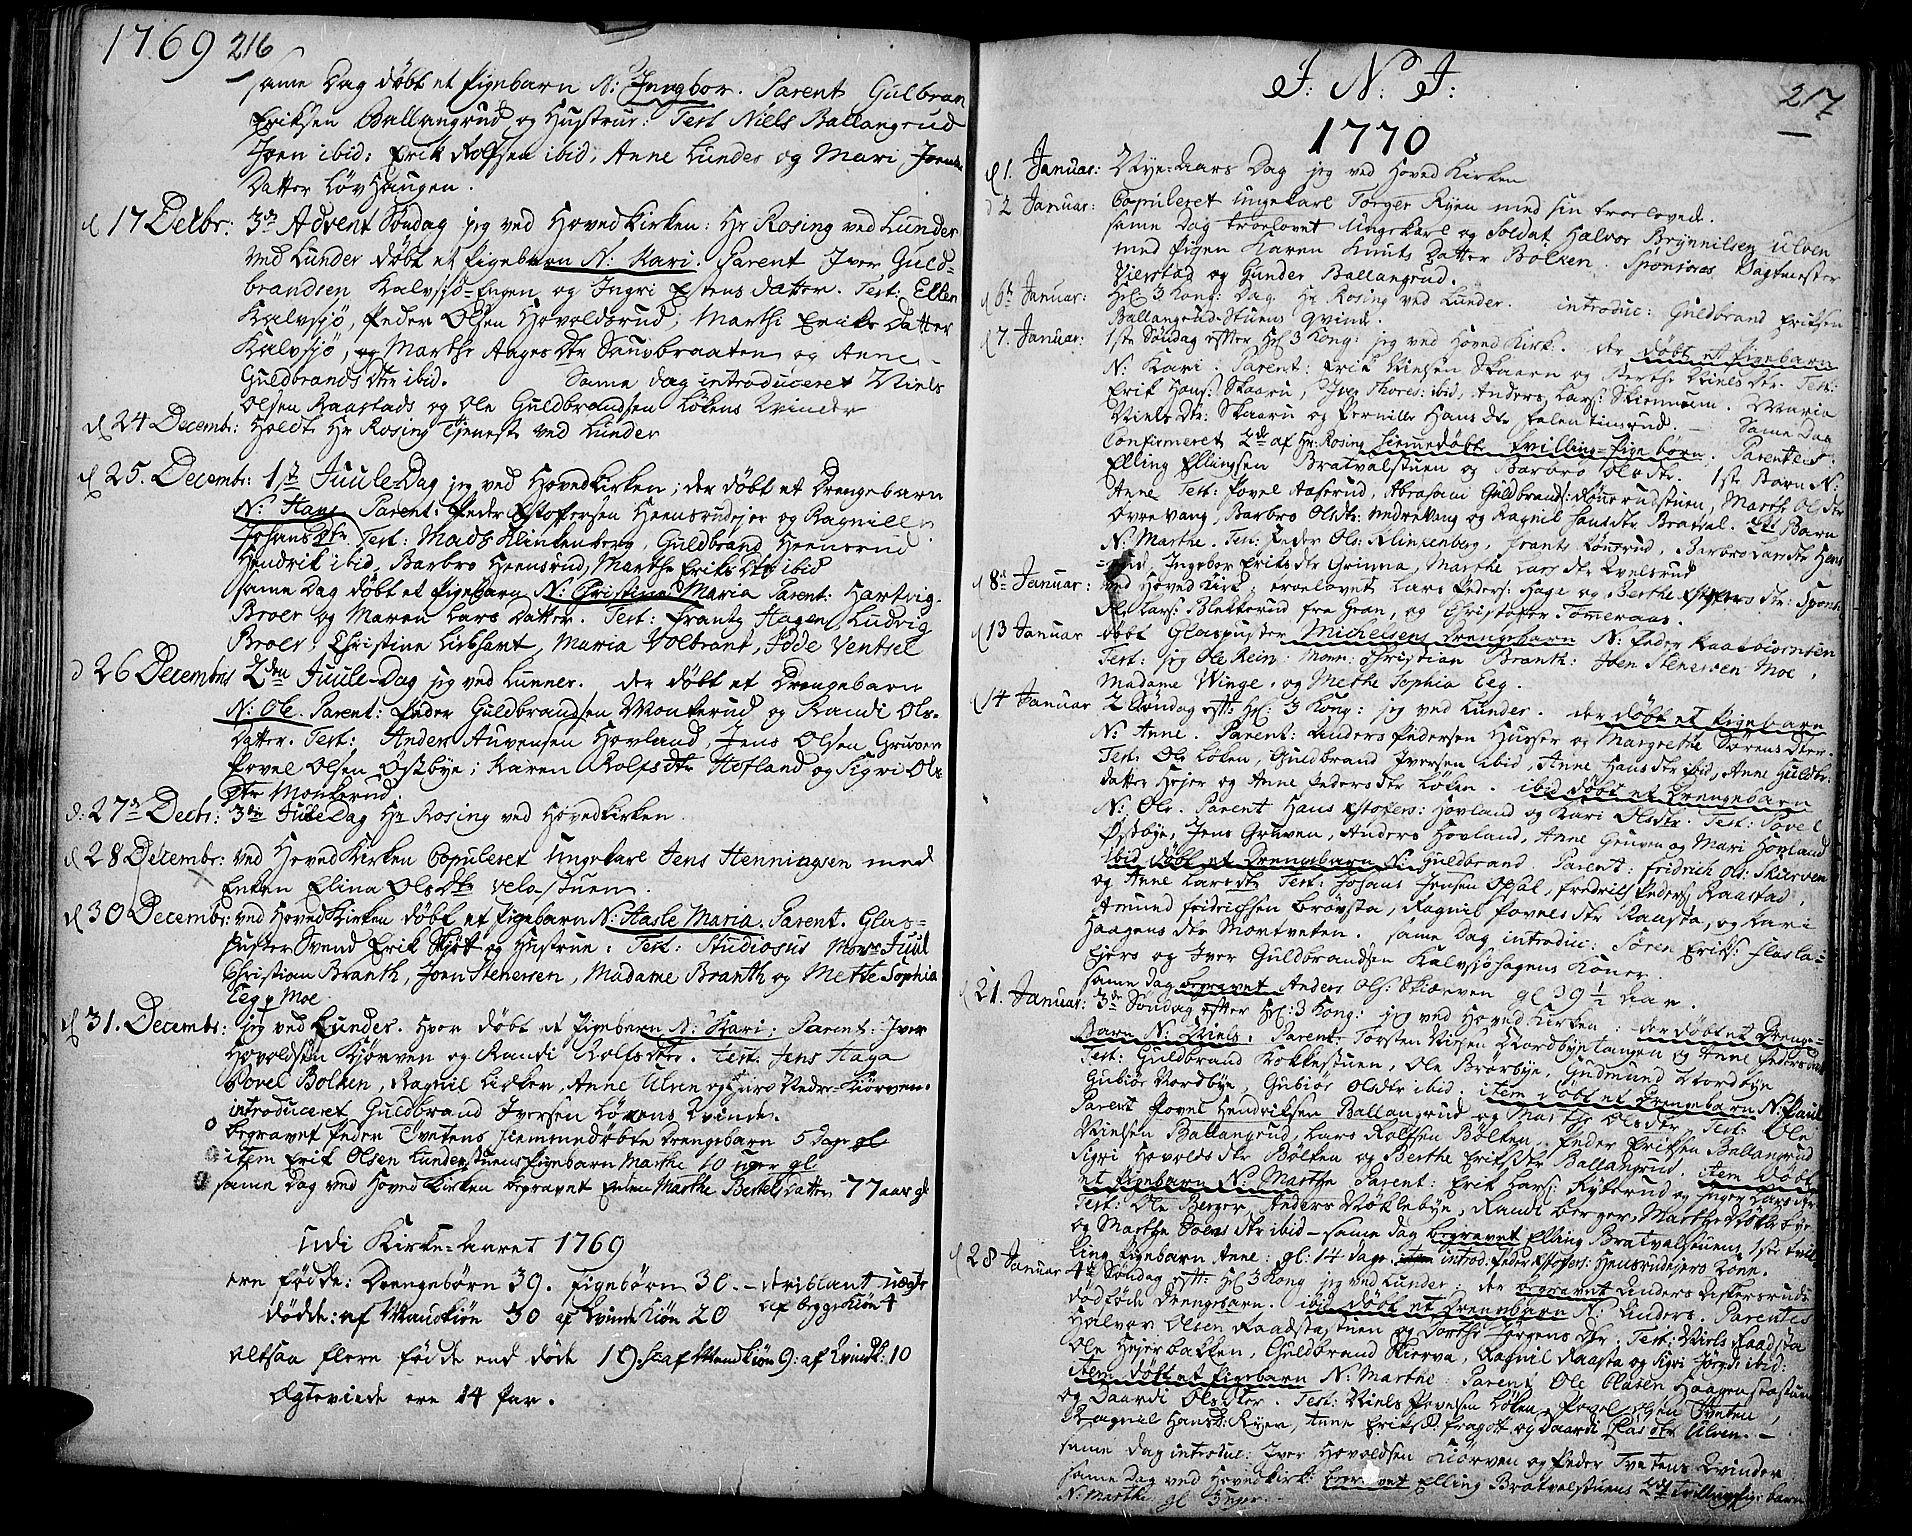 SAH, Jevnaker prestekontor, Ministerialbok nr. 3, 1752-1799, s. 216-217